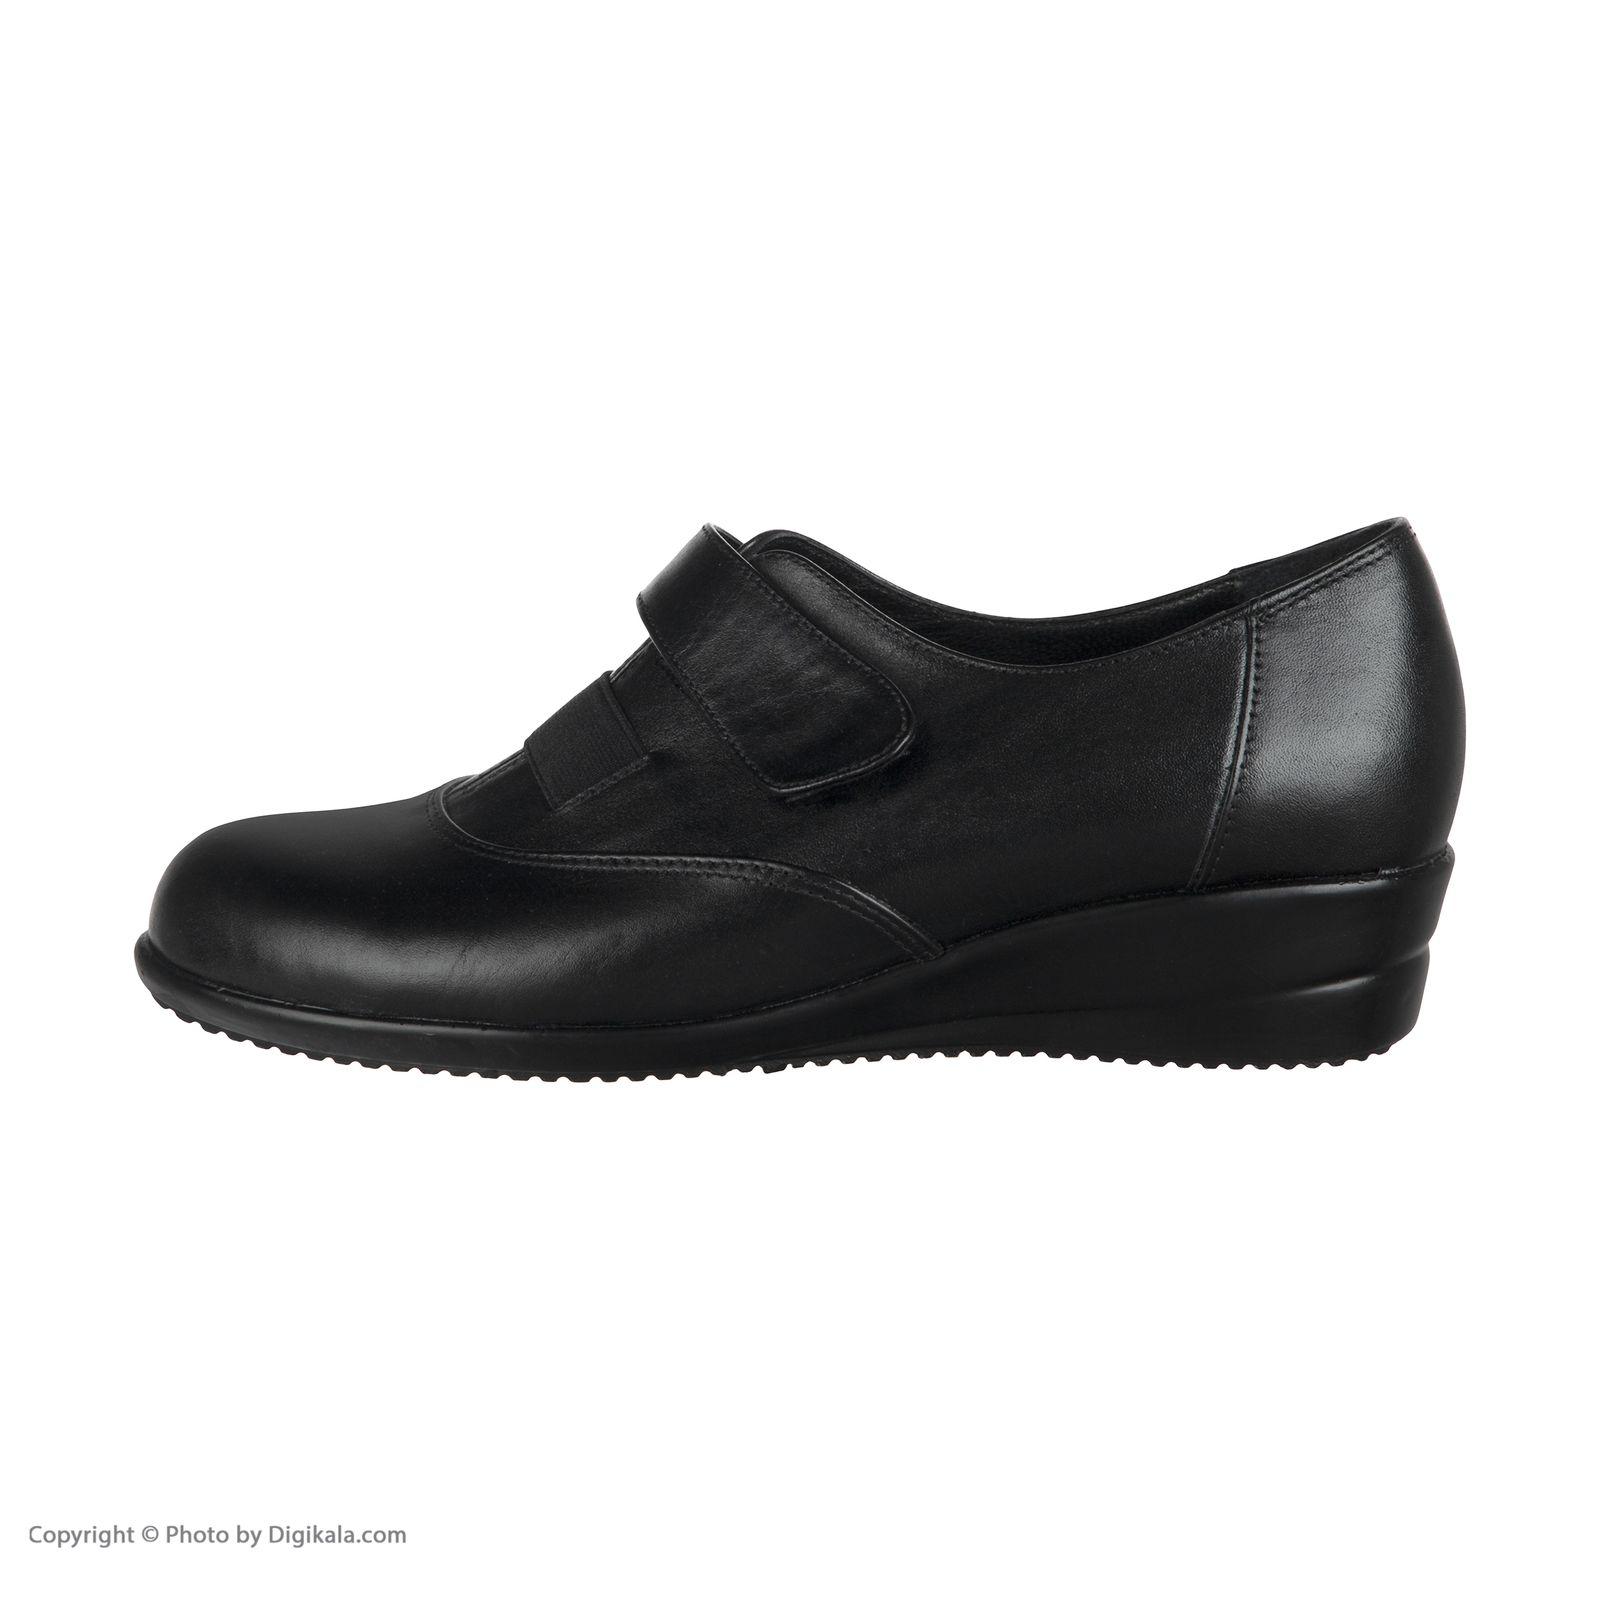 کفش روزمره زنانه سوته مدل 3070A500101 -  - 3